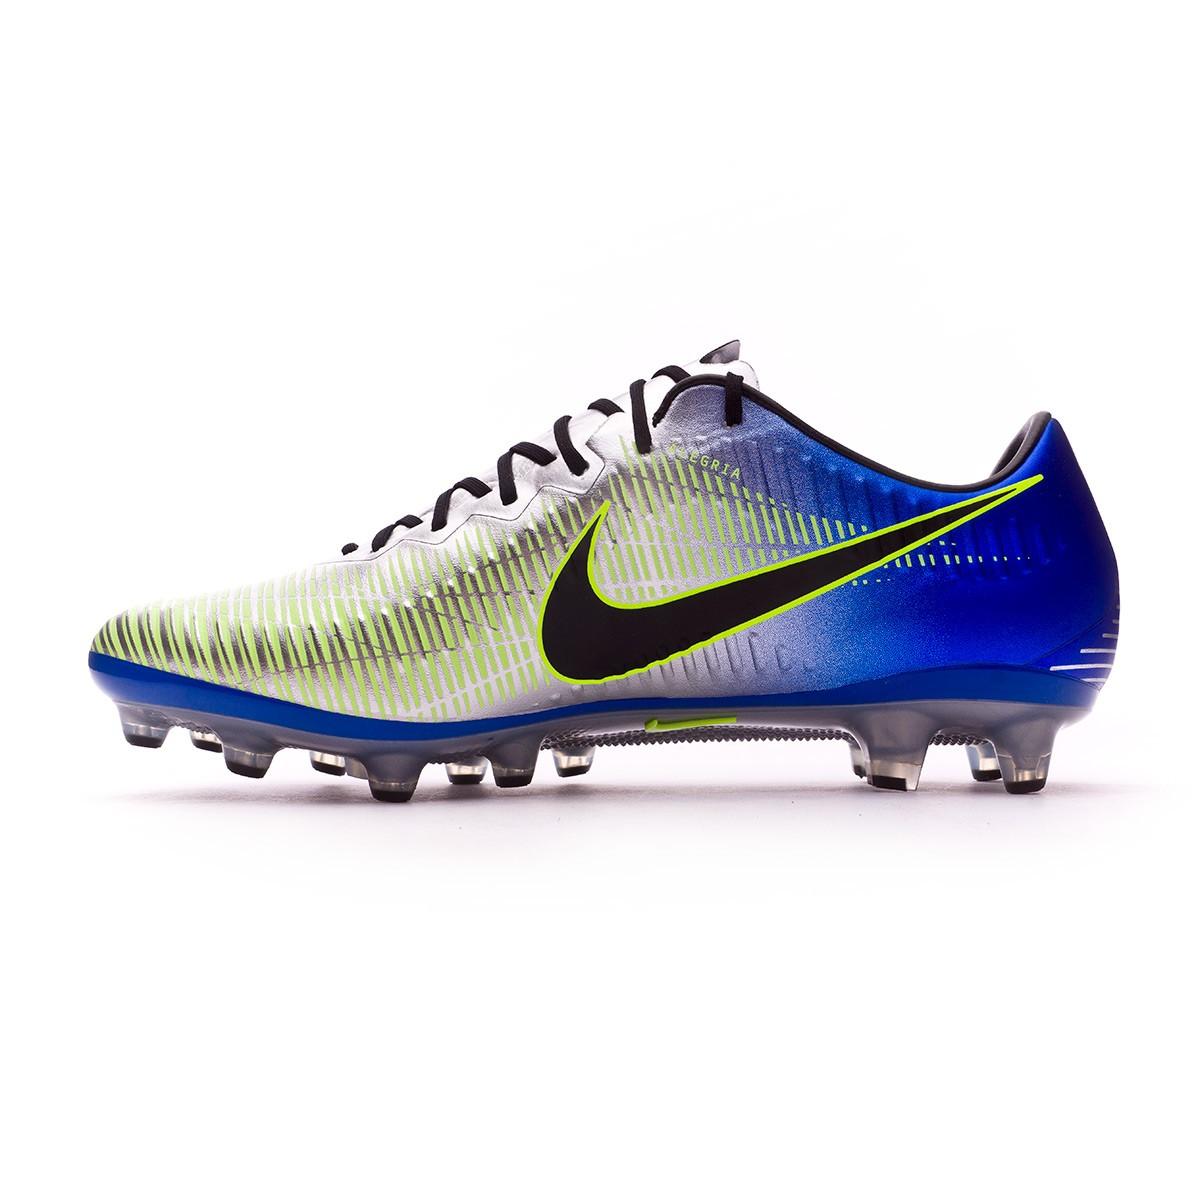 c18cf330a Football Boots Nike Mercurial Vapor XI AG-Pro Neymar Racer  blue-Black-Chrome-Volt - Football store Fútbol Emotion